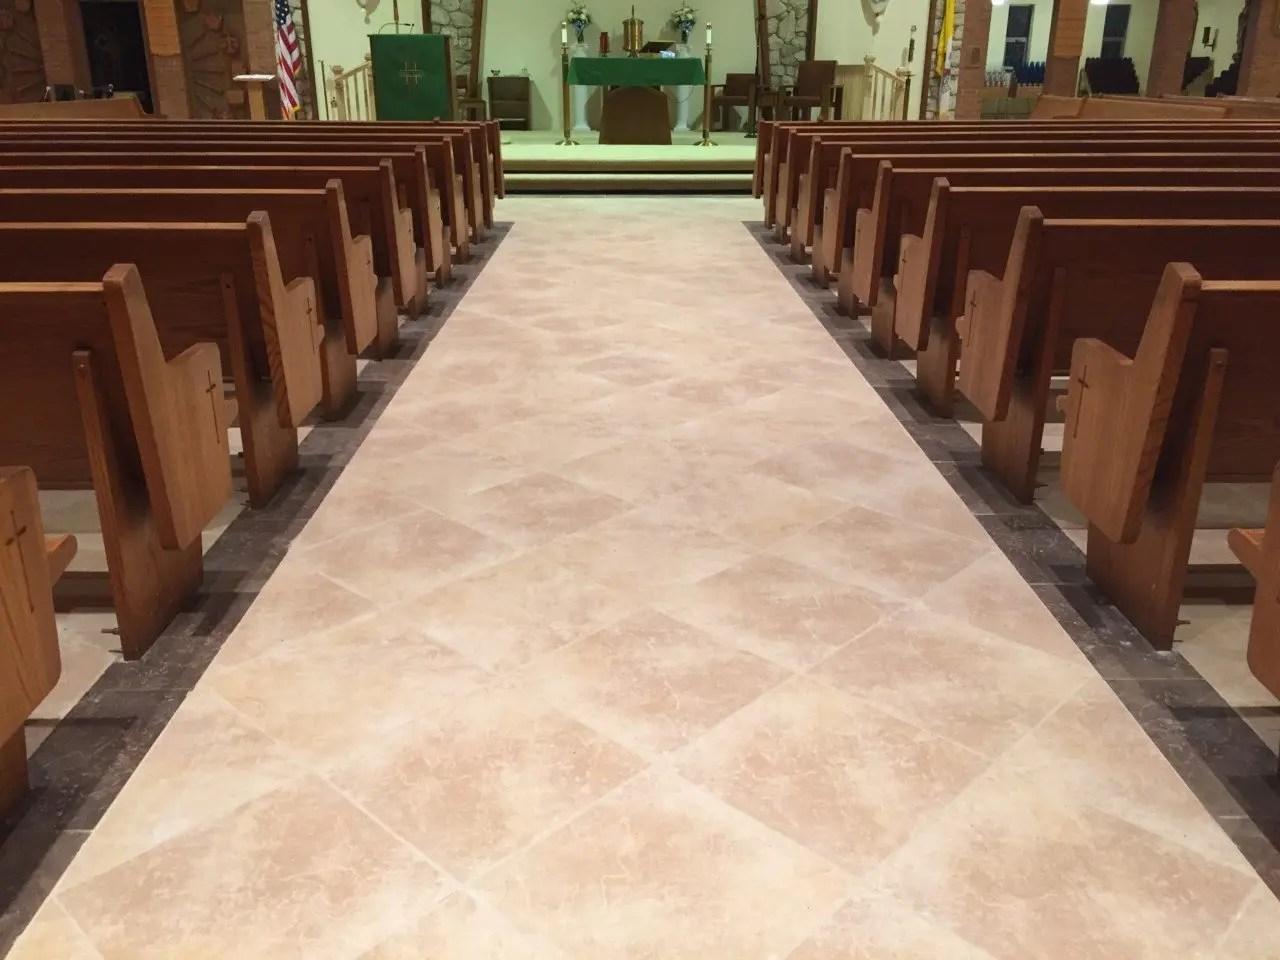 Church Tile  Marble Floors  Artech Church Interiors